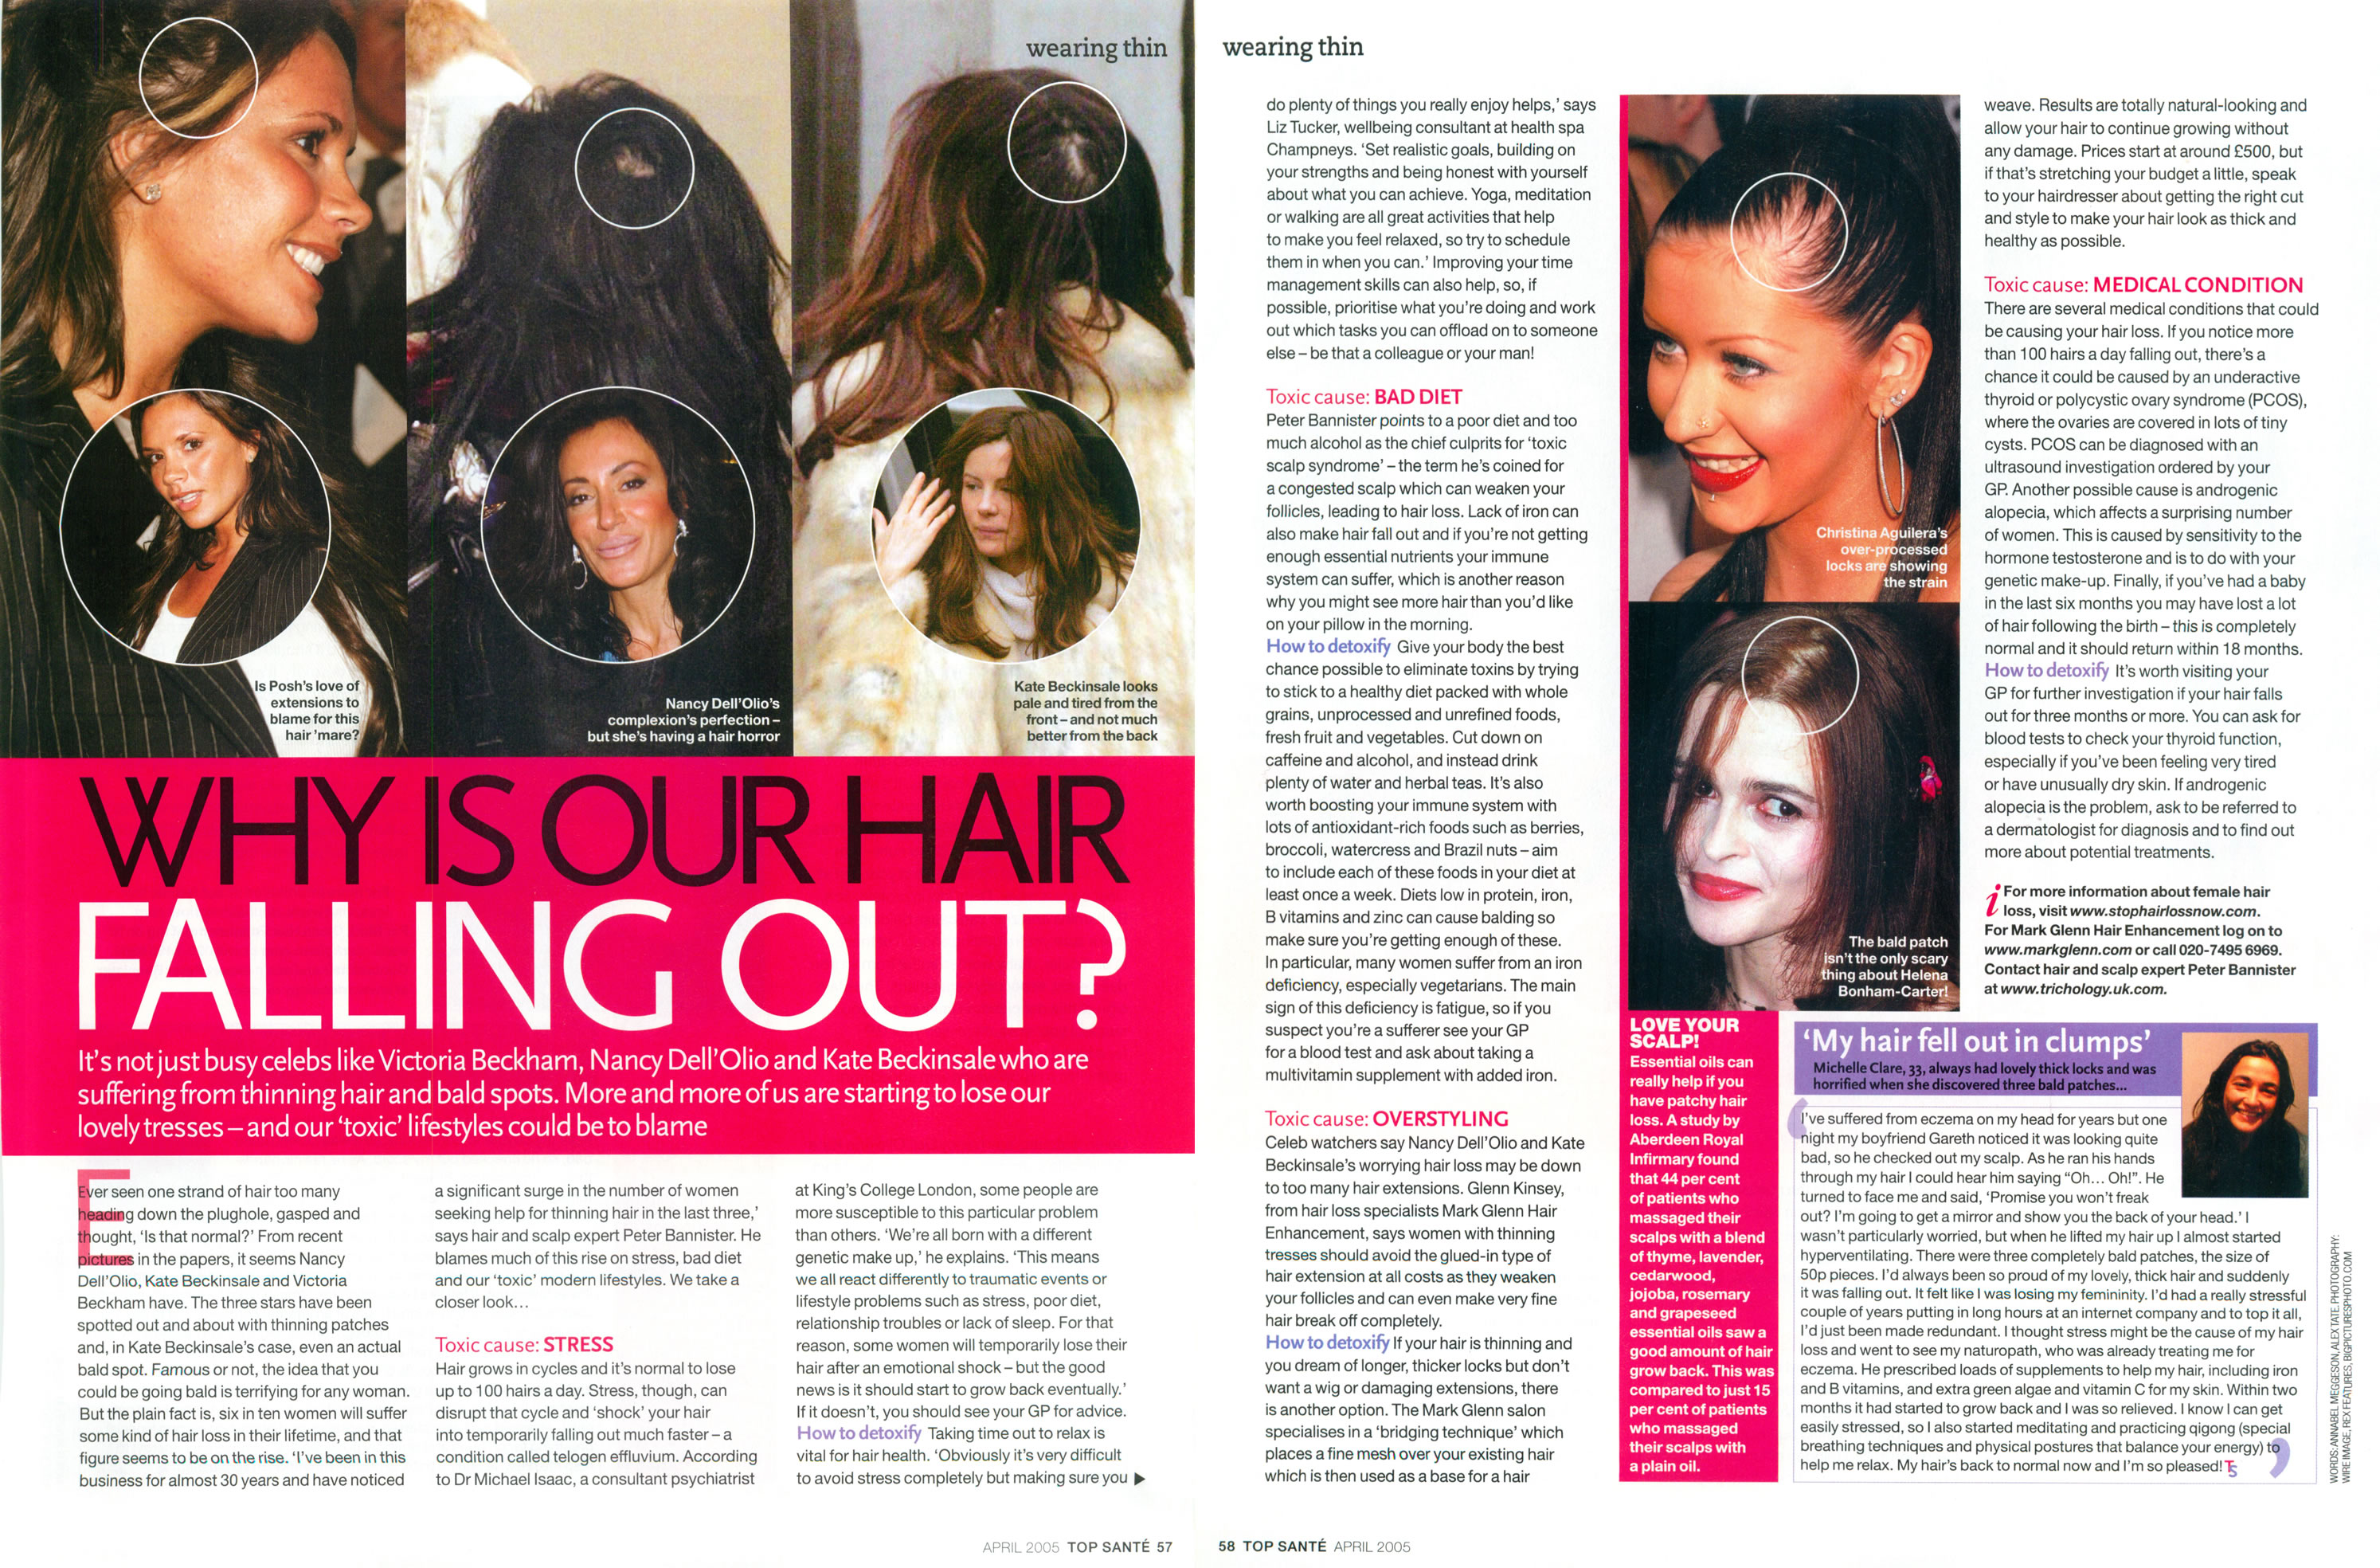 'Why is our hair falling out?' - Top Sante featuring Mark Glenn Hair Enhancement